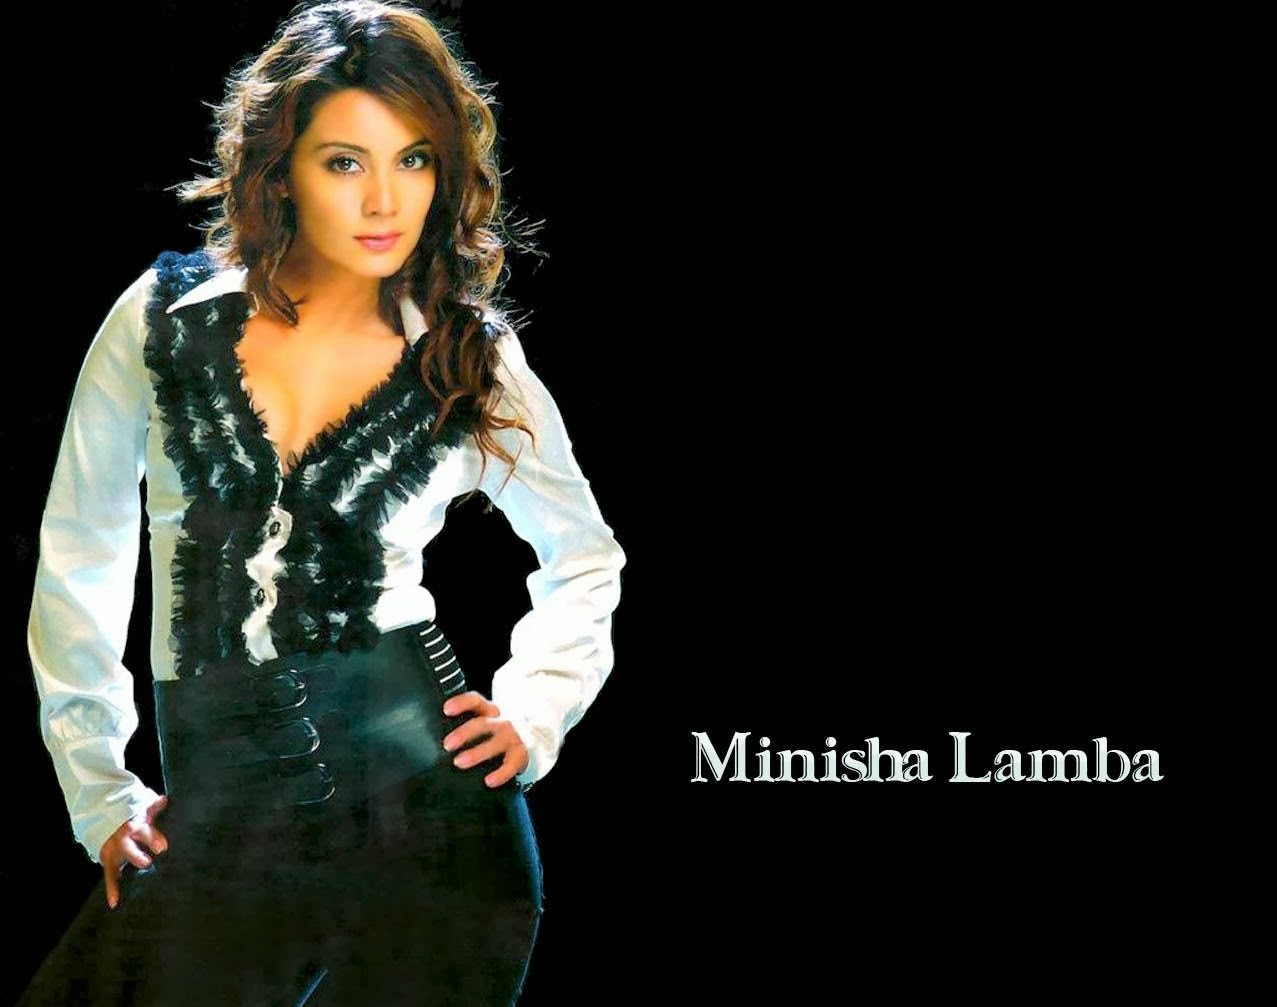 minissha lamba hot hd pics